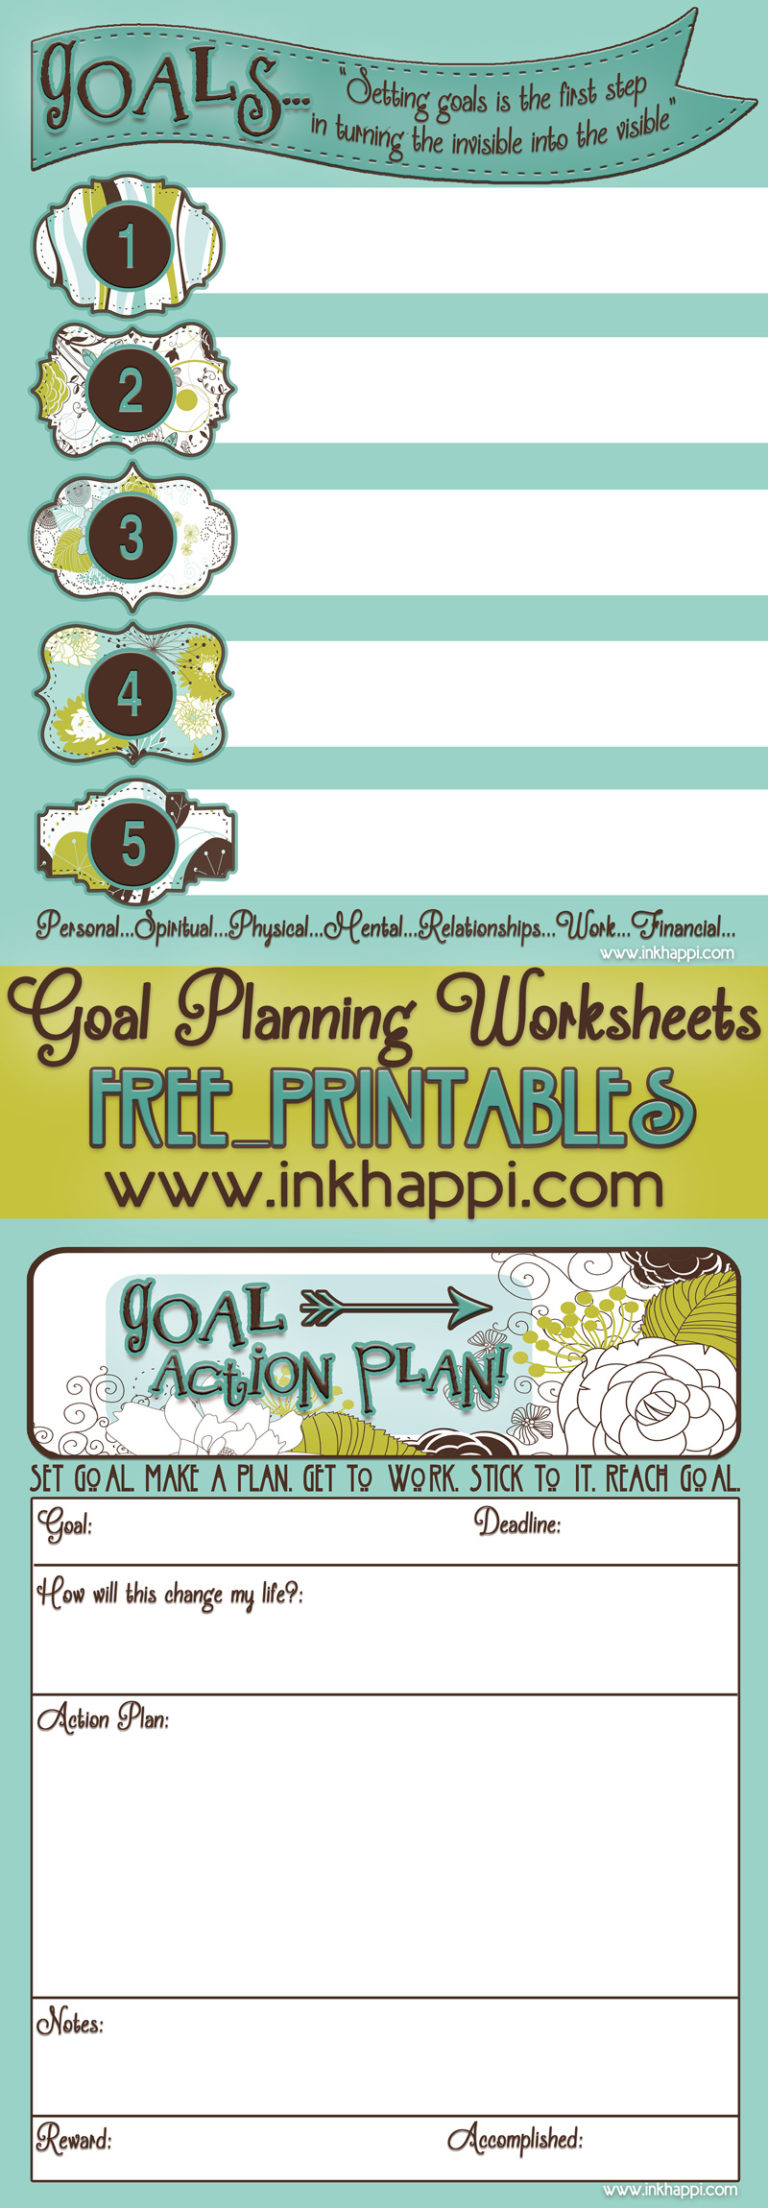 Goal planning worksheet pdf